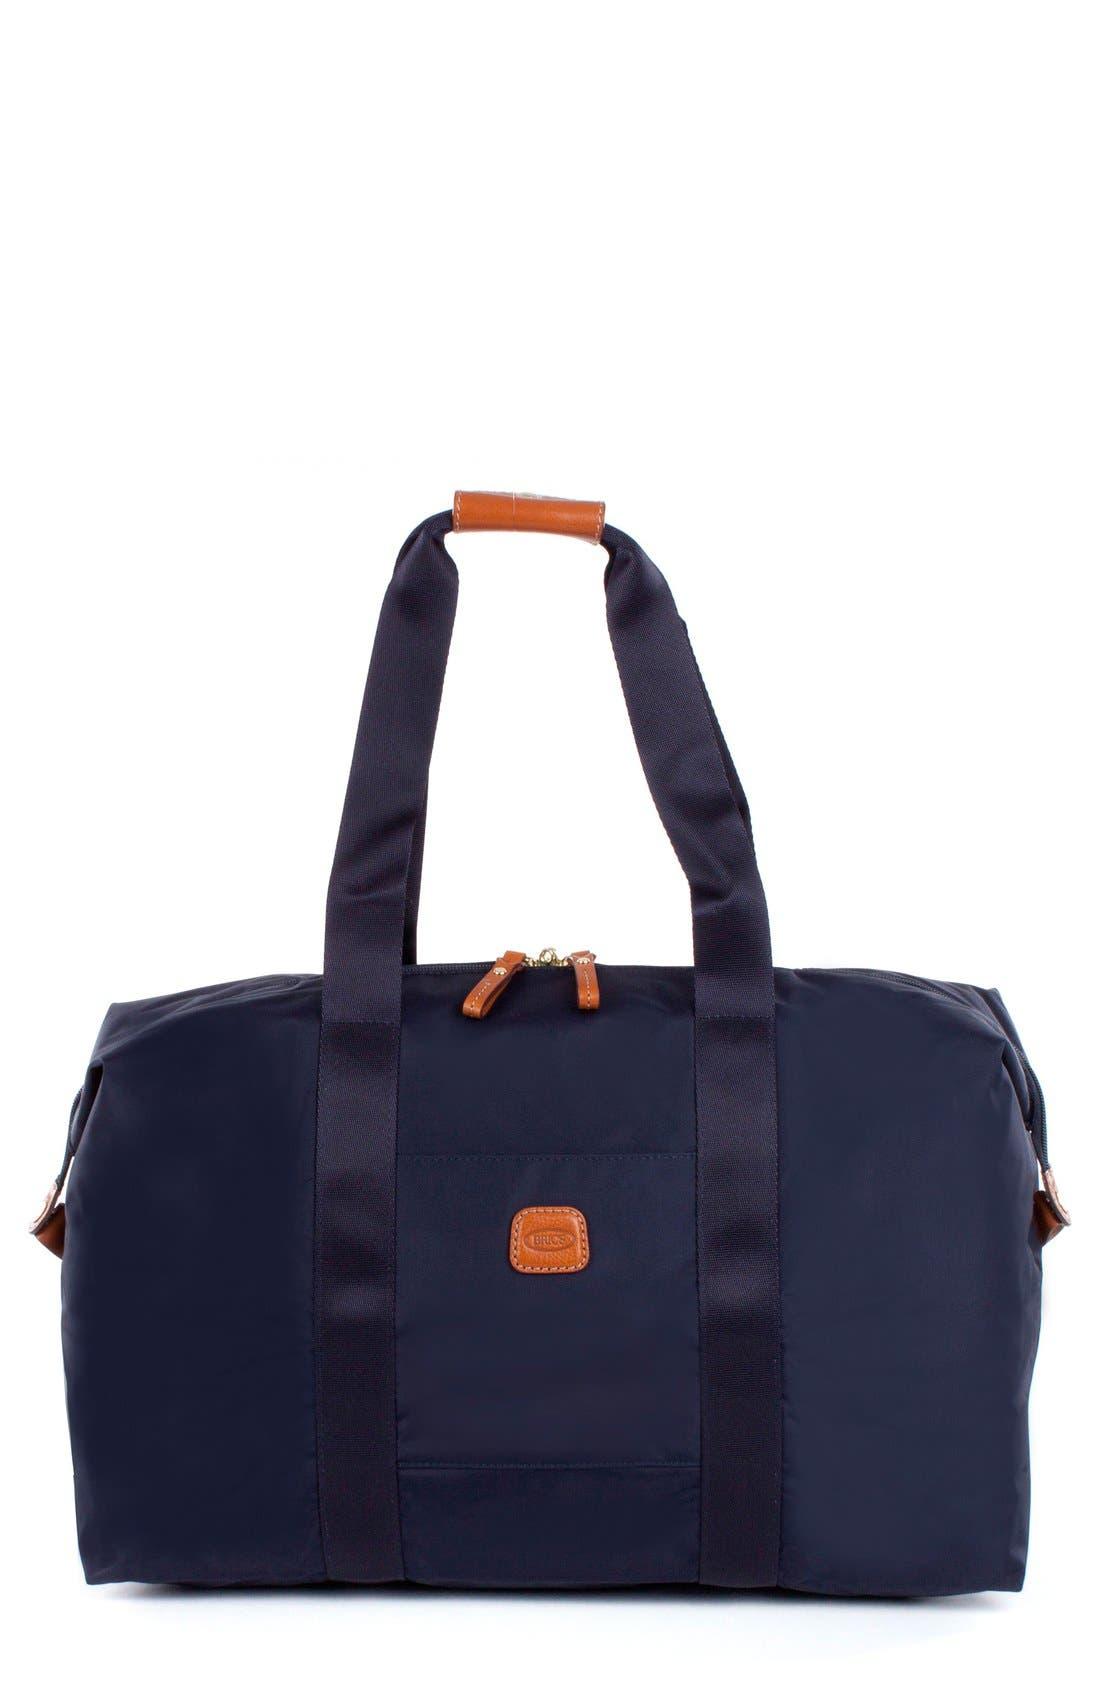 'X-Bag' Folding Duffel Bag,                         Main,                         color, 410